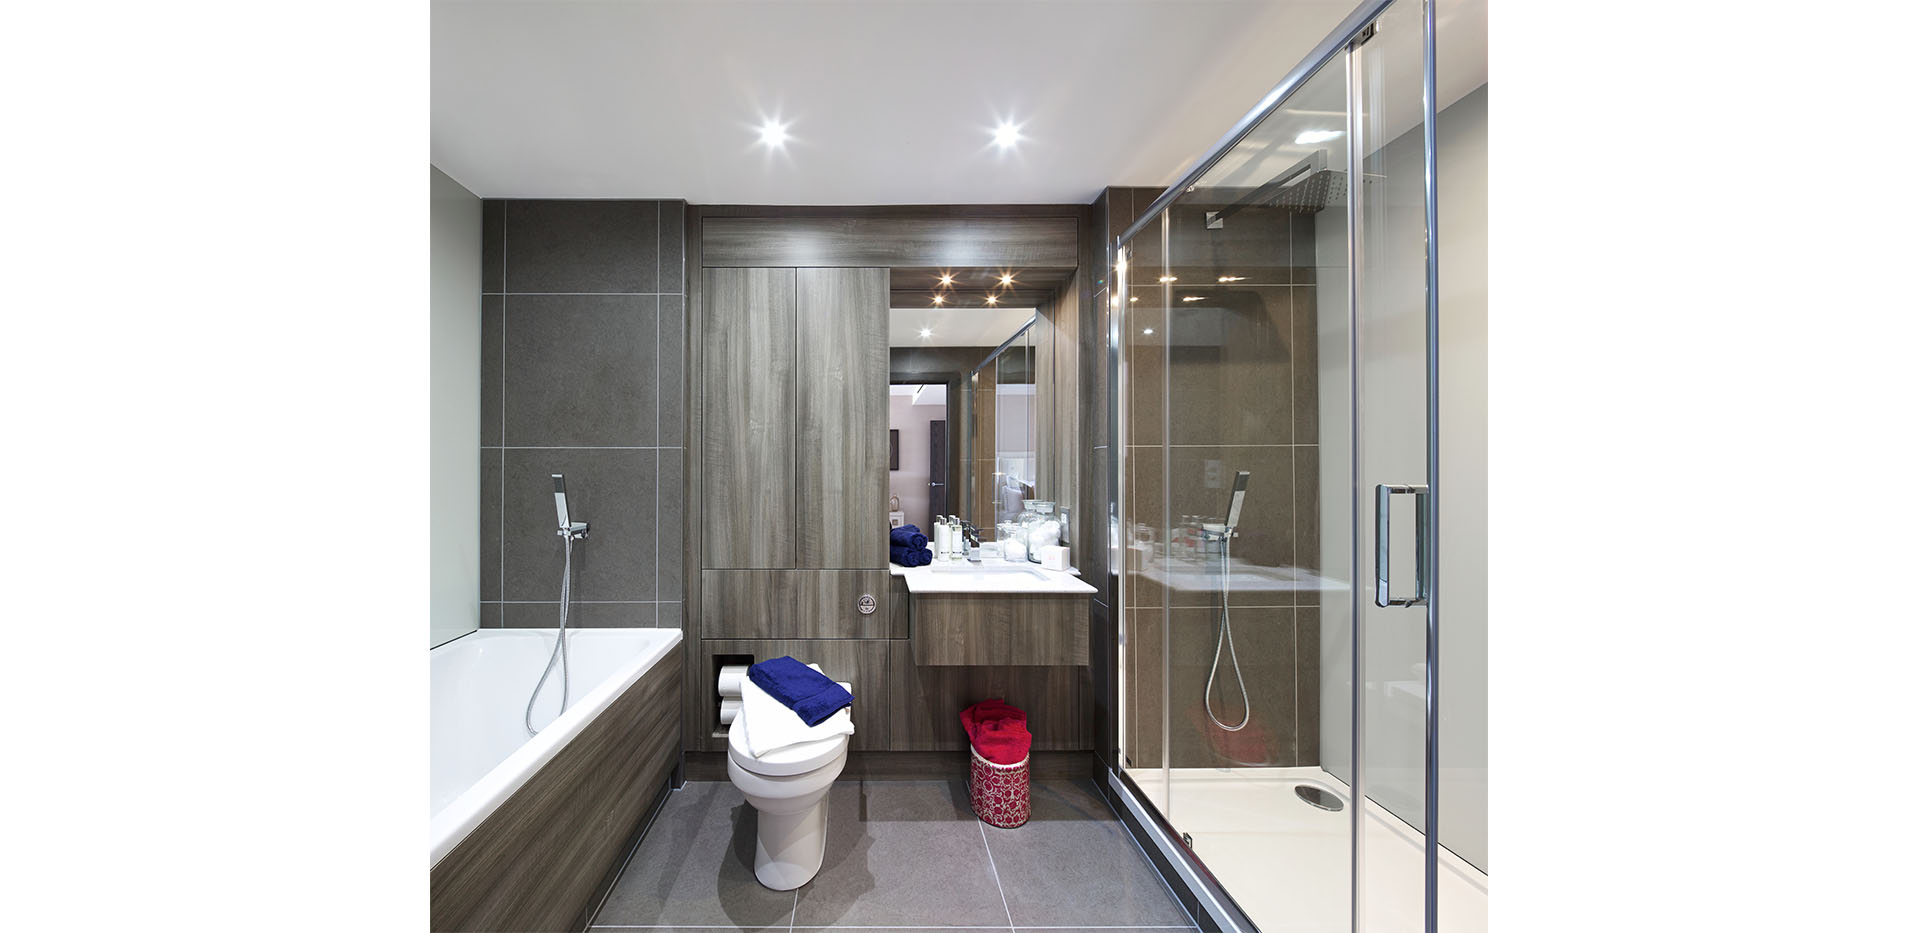 St George, Beaufort Park, 3 Bed Premier Bathroom